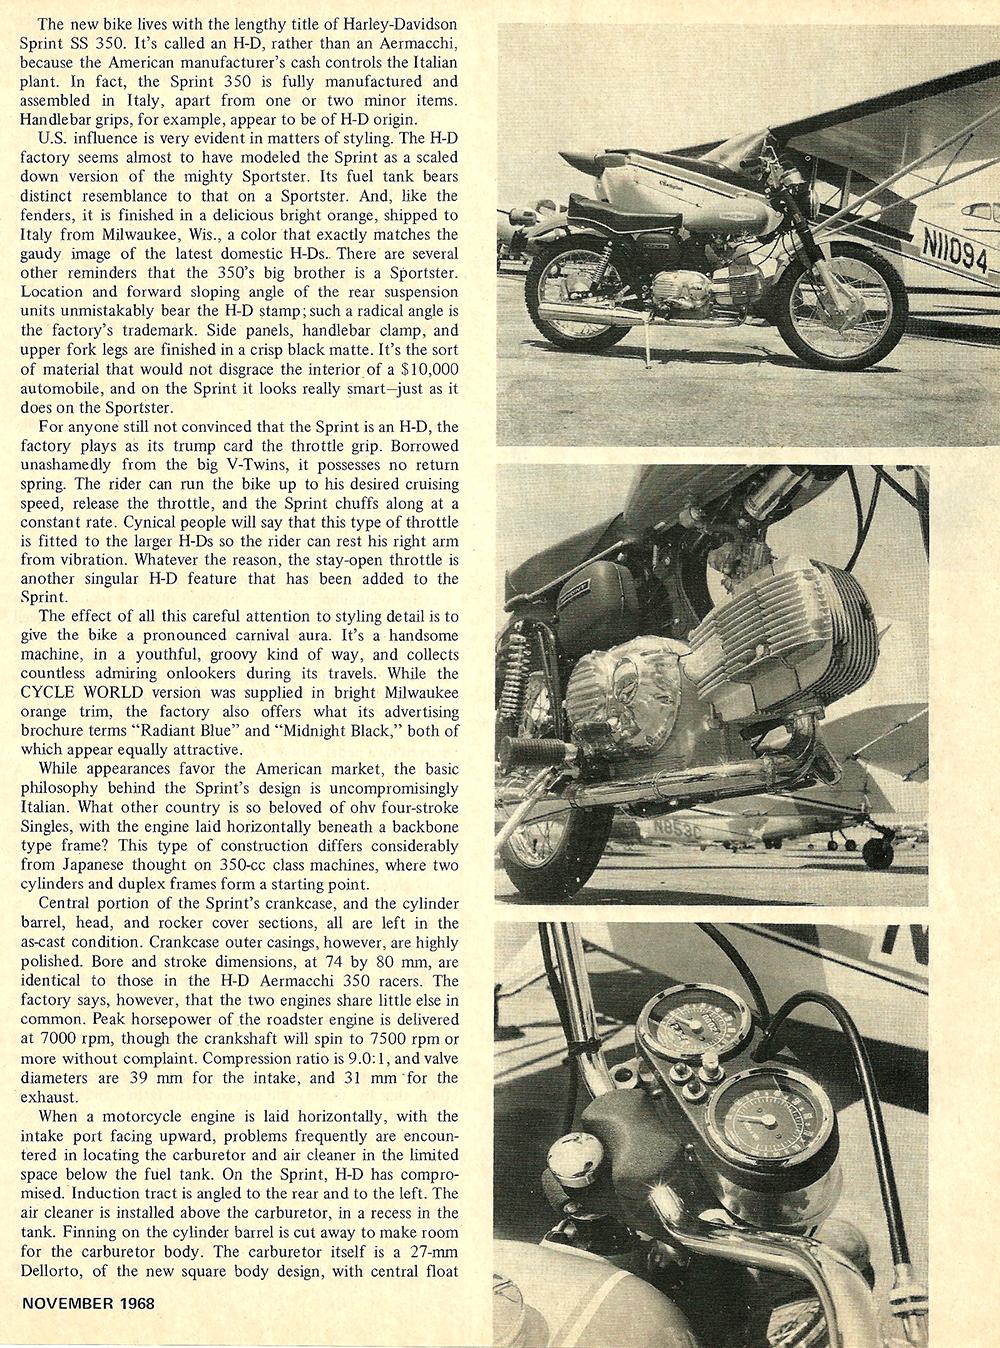 1968 Harley Sprint ss 350 road test 02.jpg